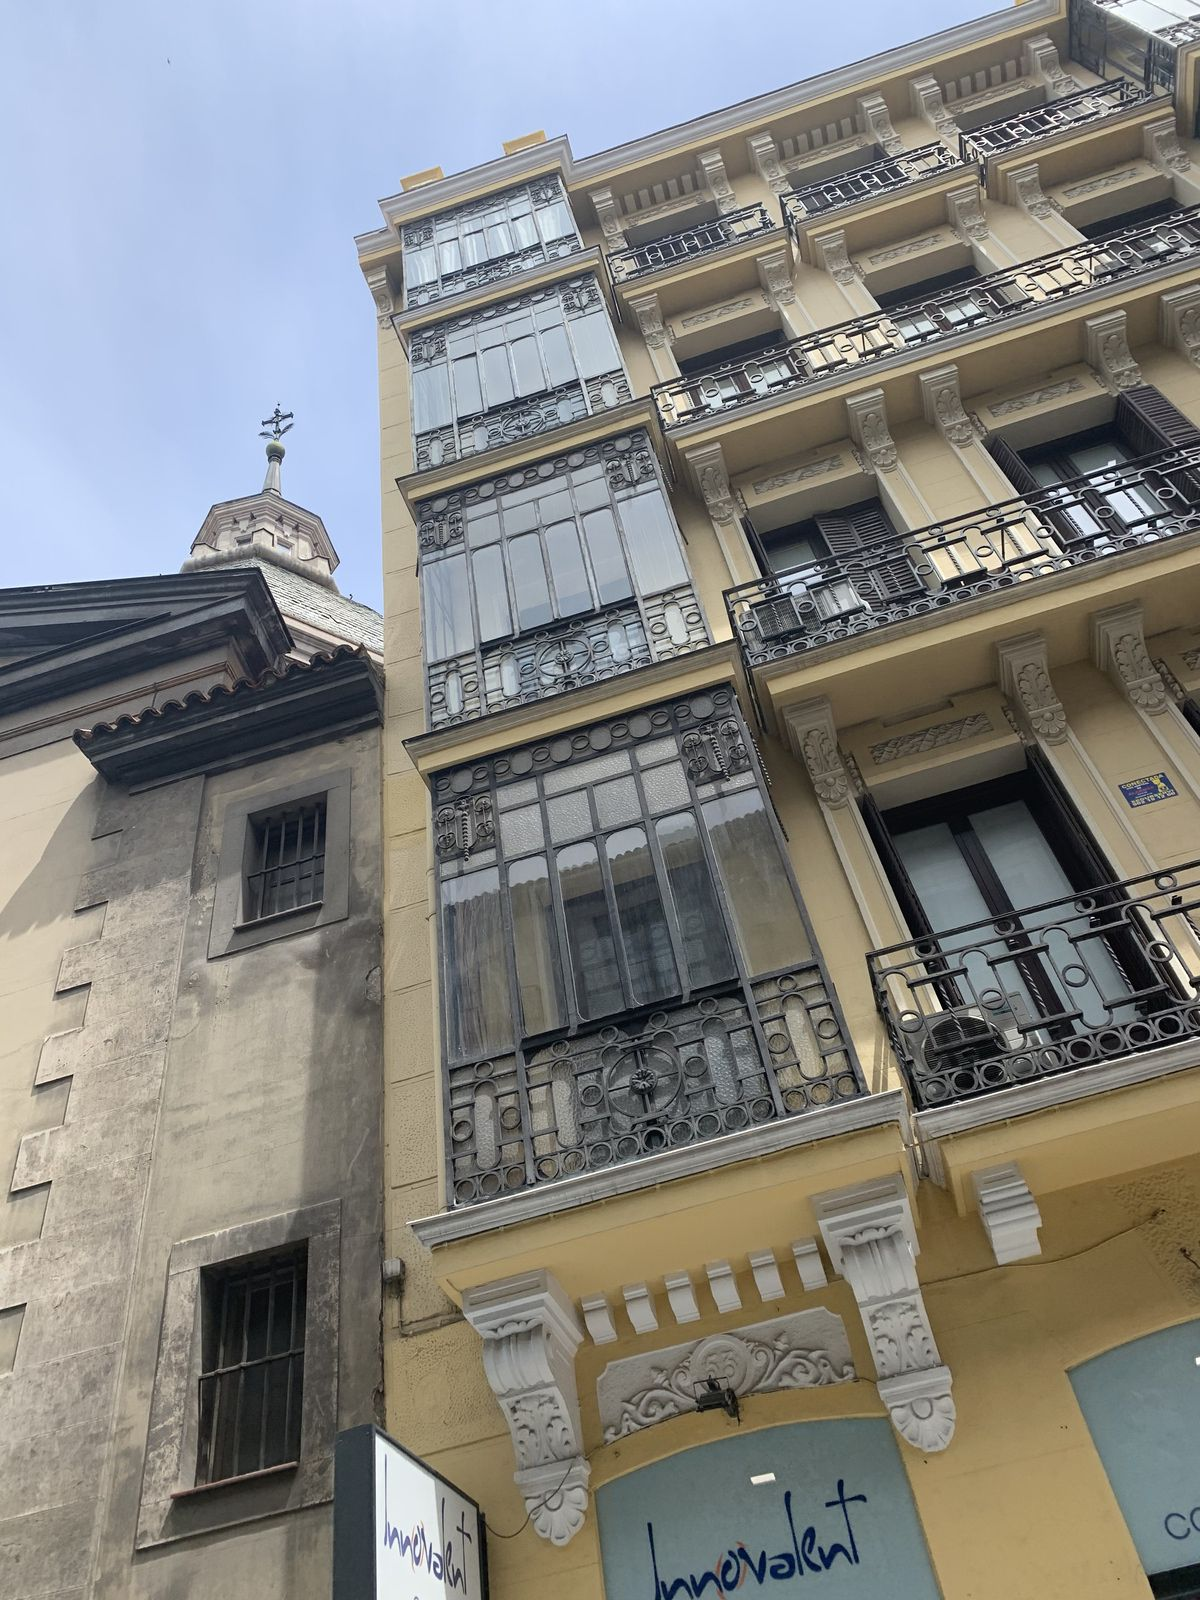 Puerta del sol, Quartier piétonnier et ses façades anciennes.